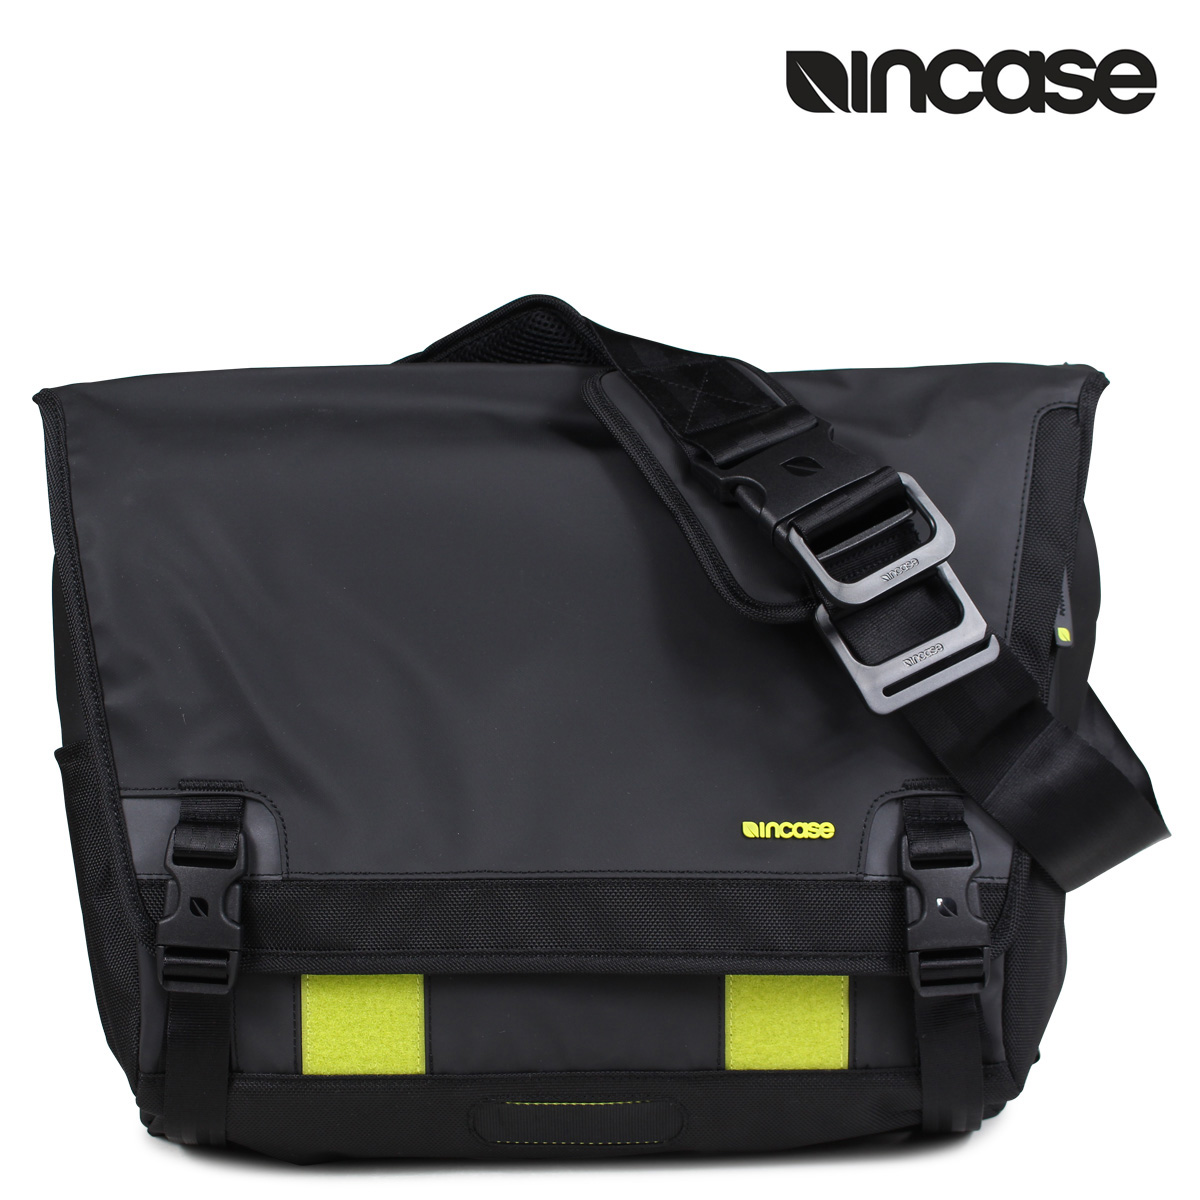 INCASE インケース バック メッセンジャー ショルダーバッグ CL55539 RANGE MESSENGER BAG FOR 15MacBook Pro メンズ ブラック